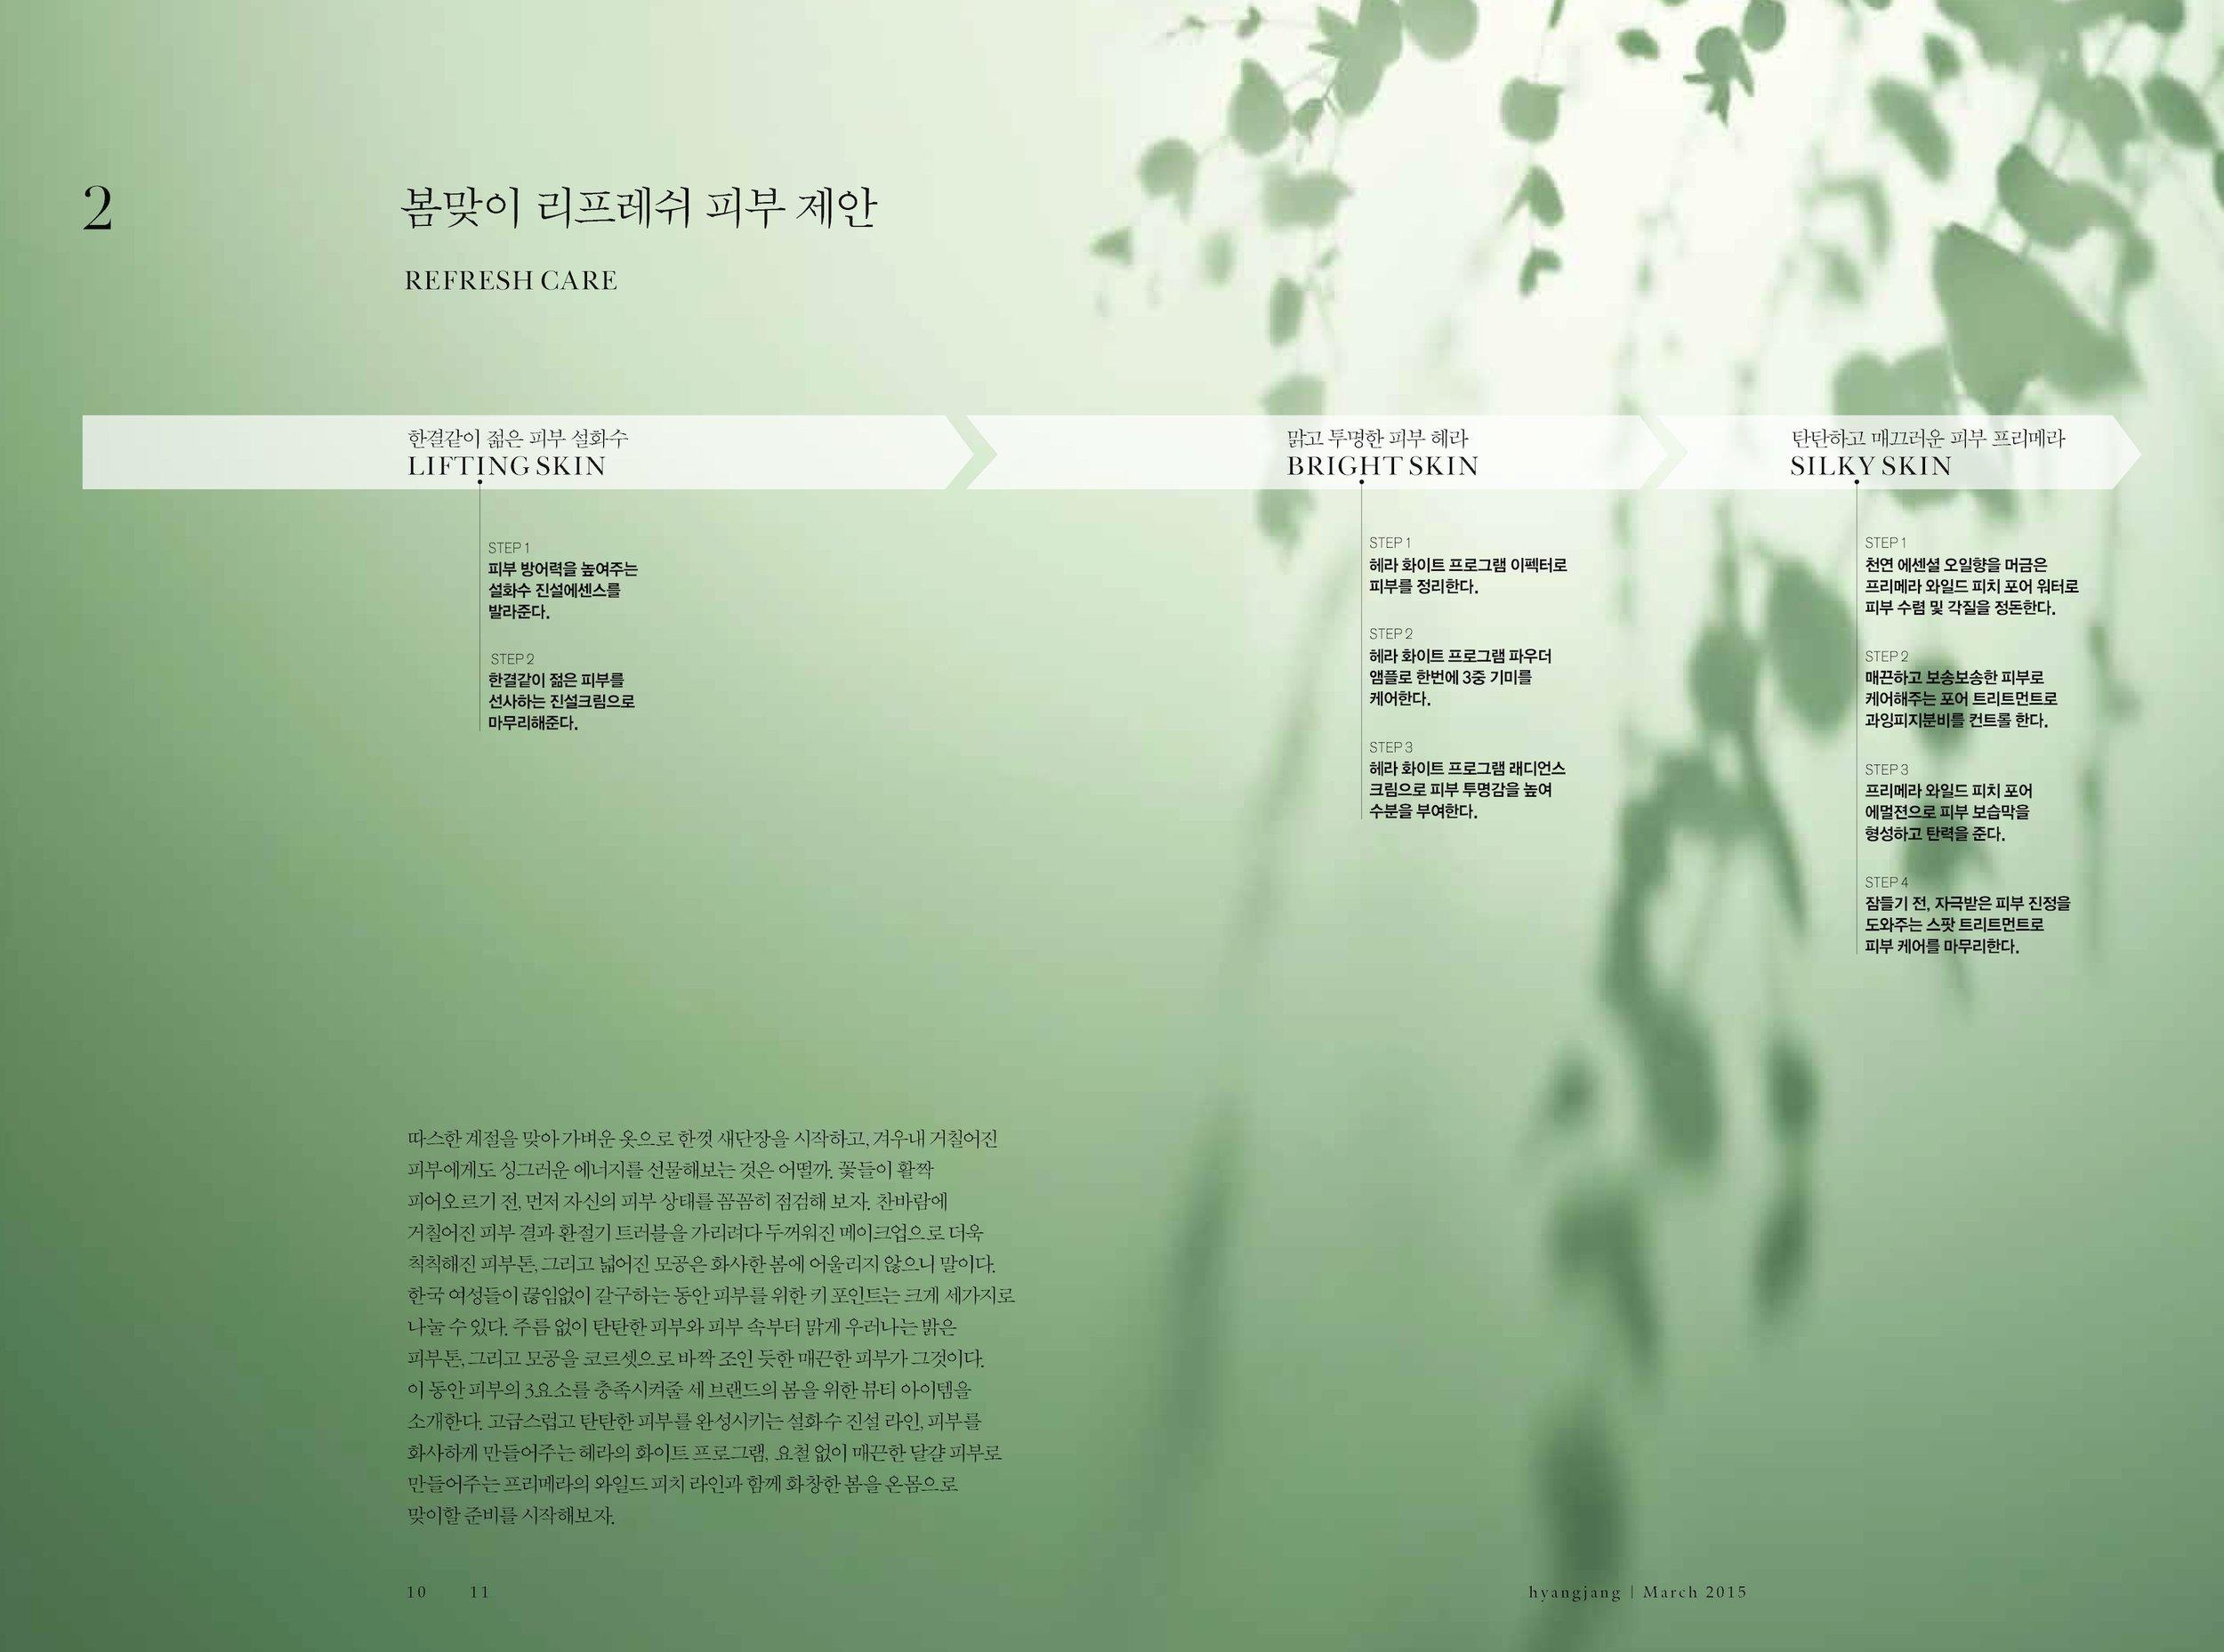 hyangjang-201503_페이지_06.jpeg